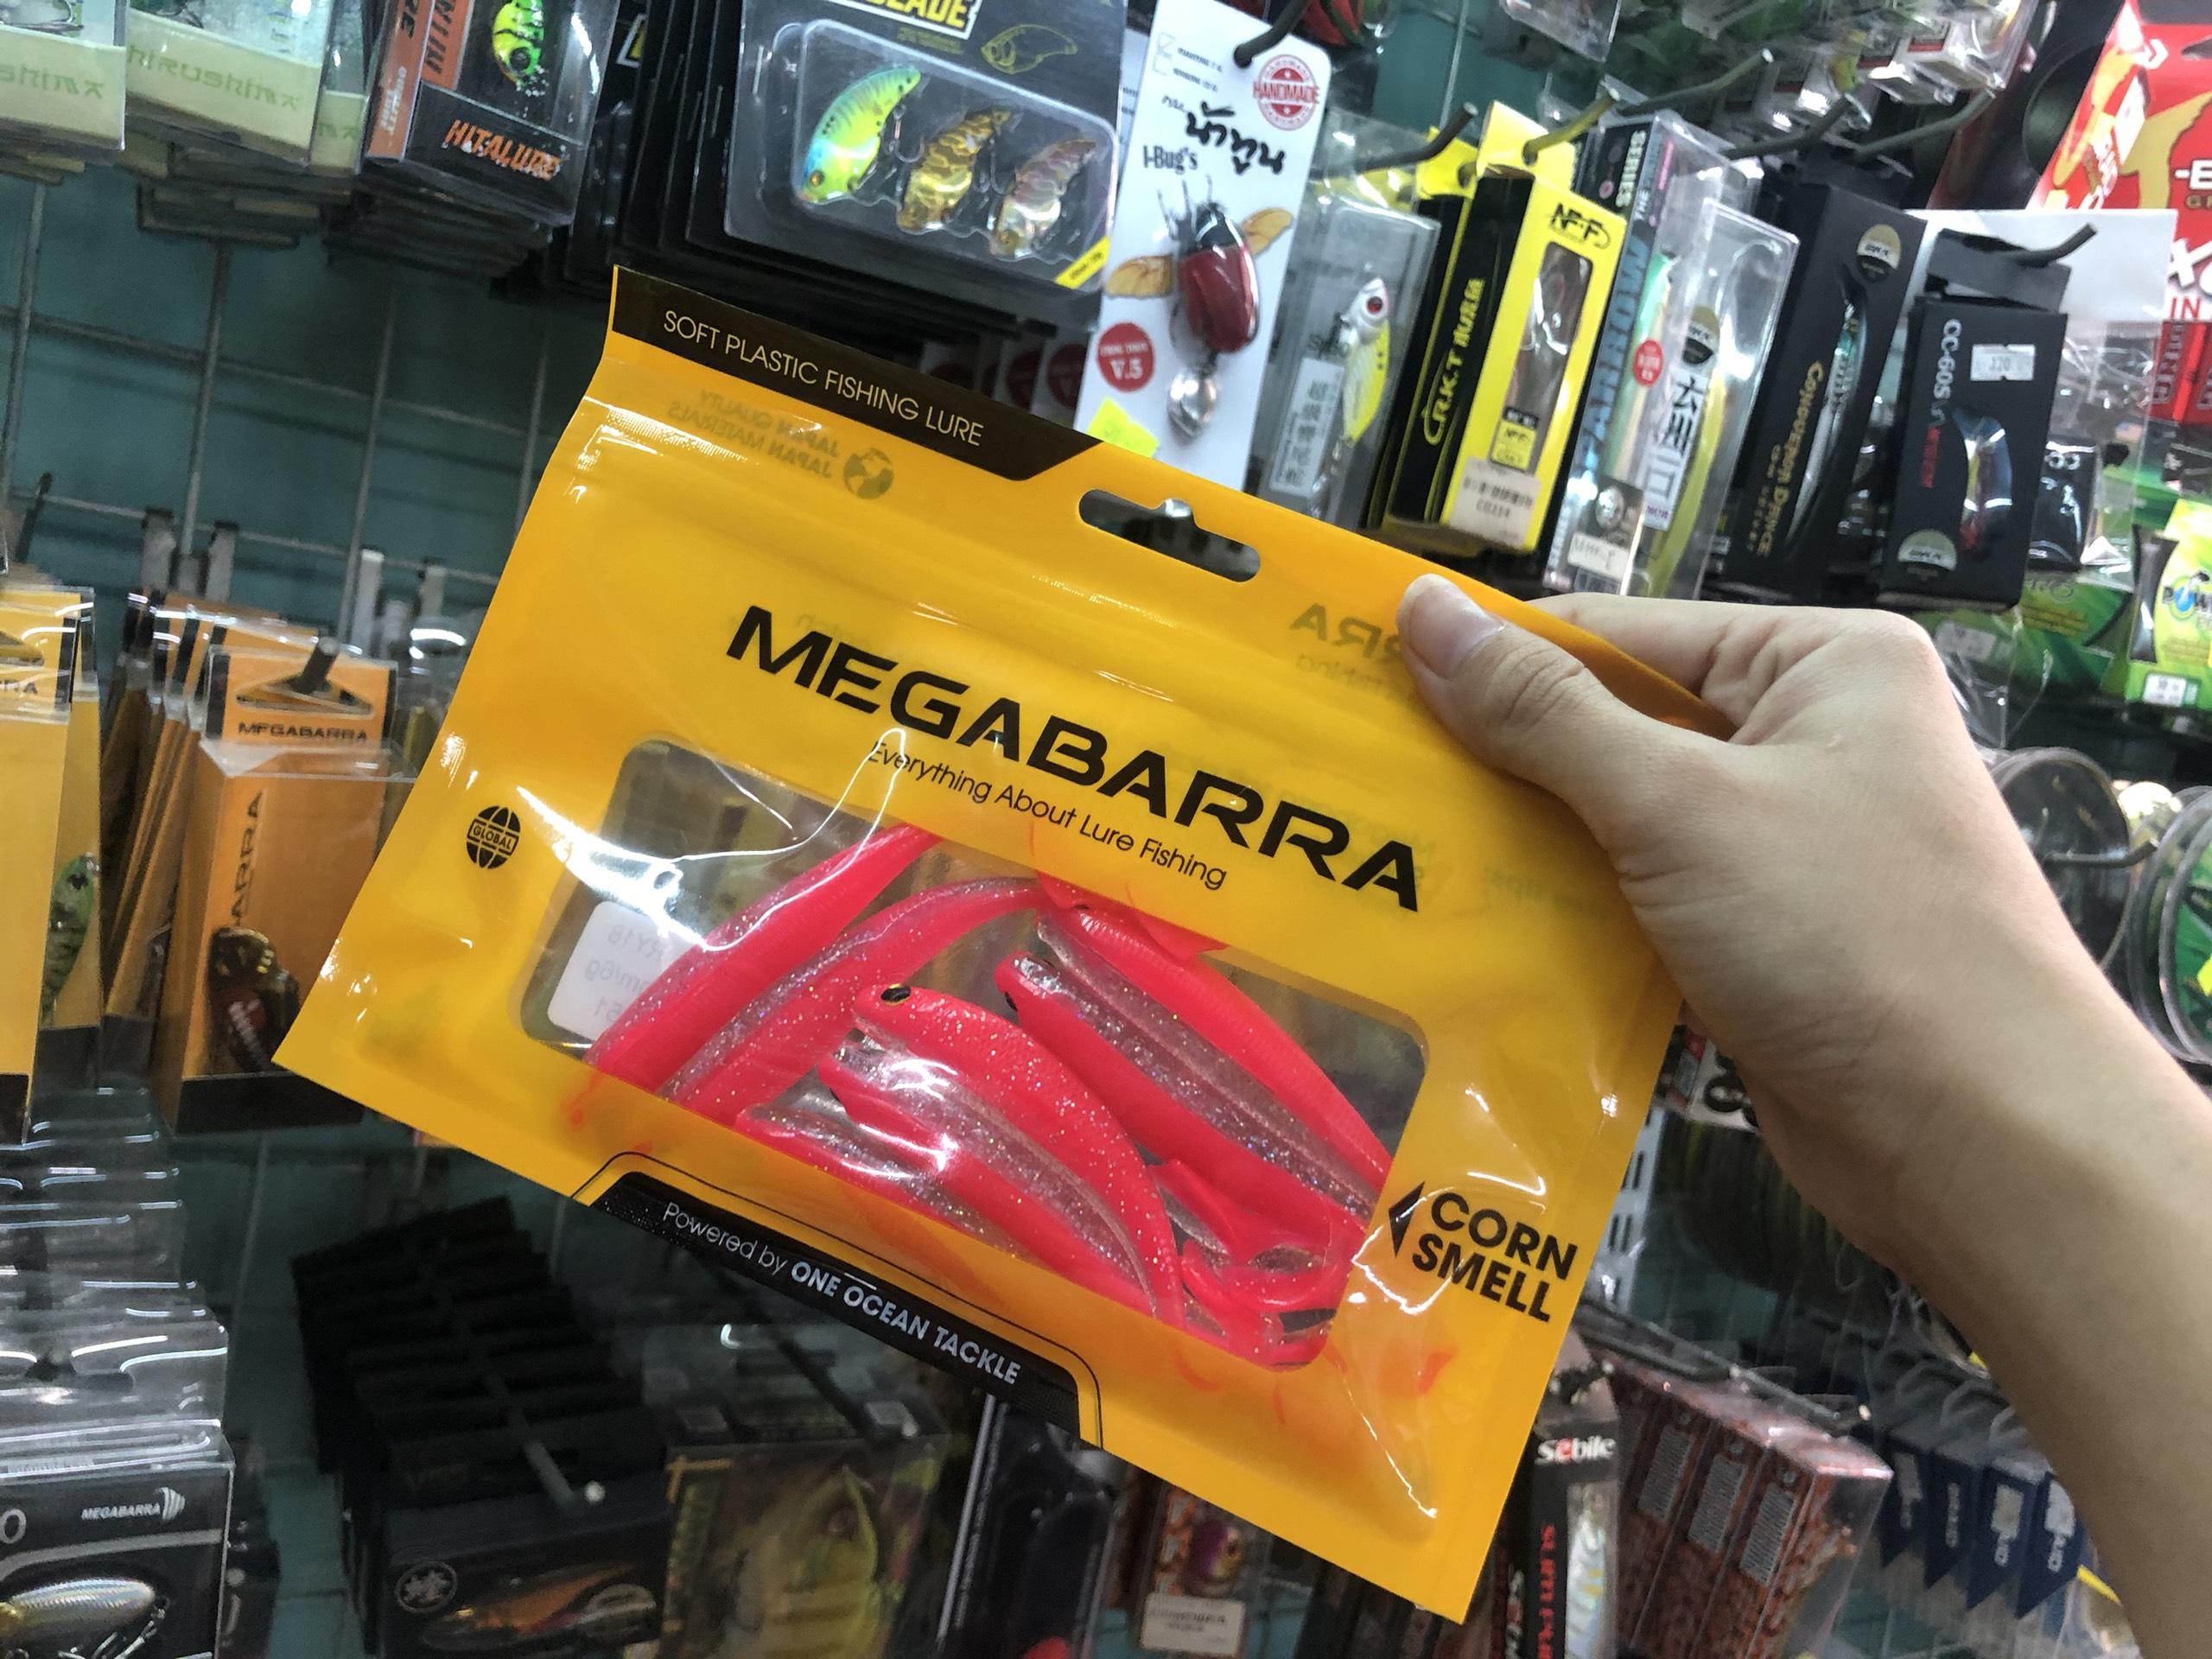 Mồi mềm Megabarra set 7 con